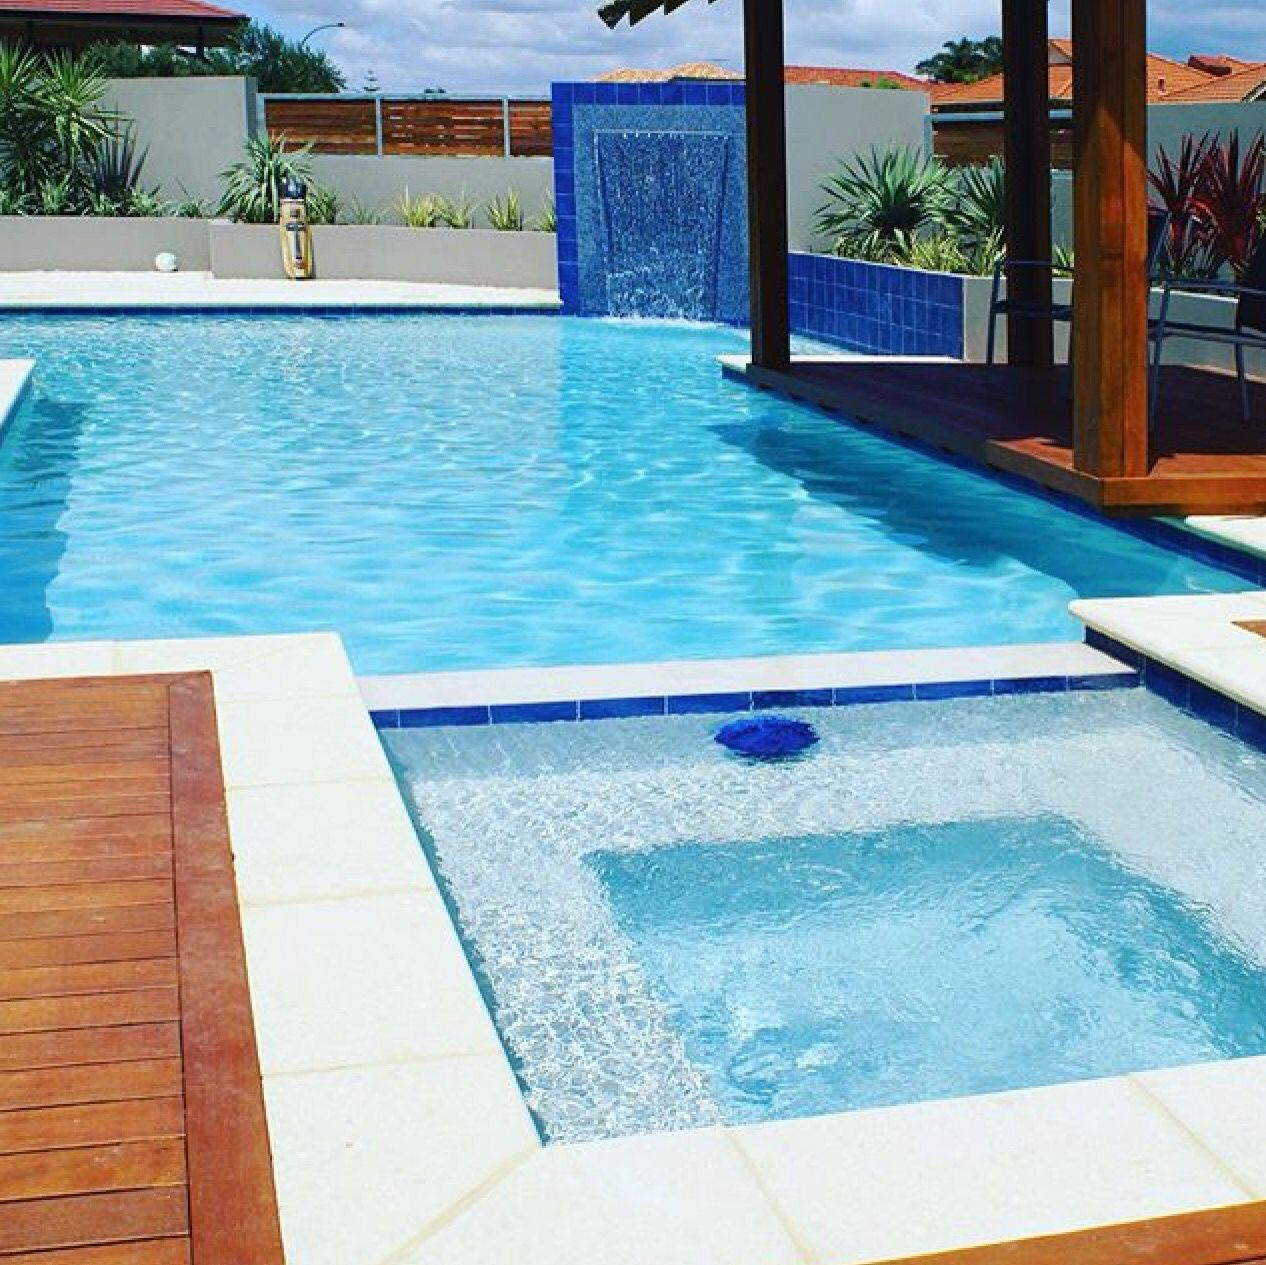 Swimming Pools, Porches, Patios, Facades, Housing